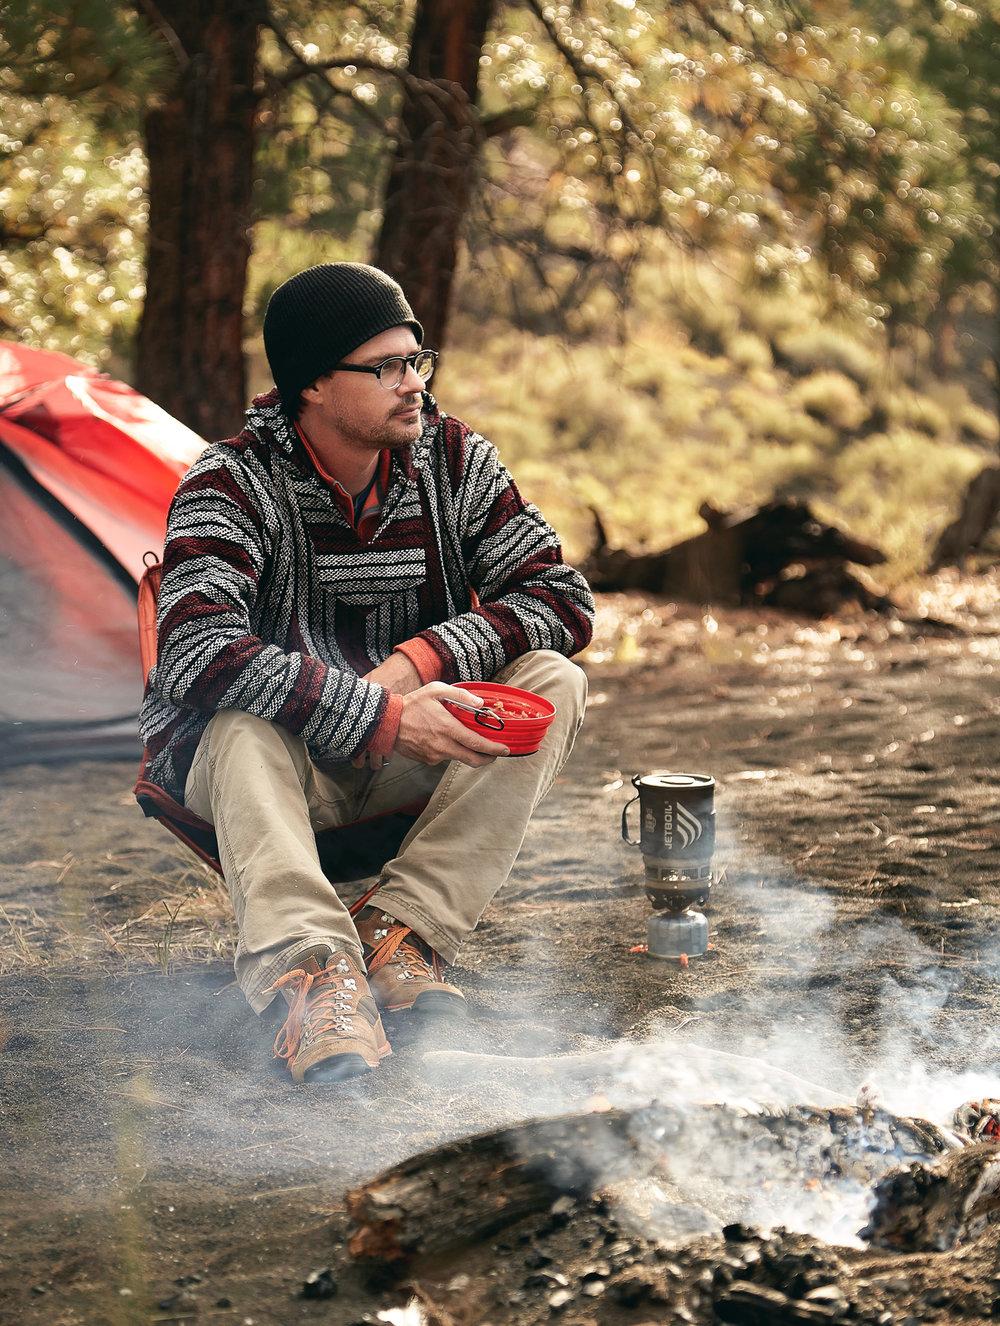 2016_Brandon-Tigrett_Scottsdale_Flagstaff_Camp_Trip-275_Retouched_WEB_Portfolio.jpg